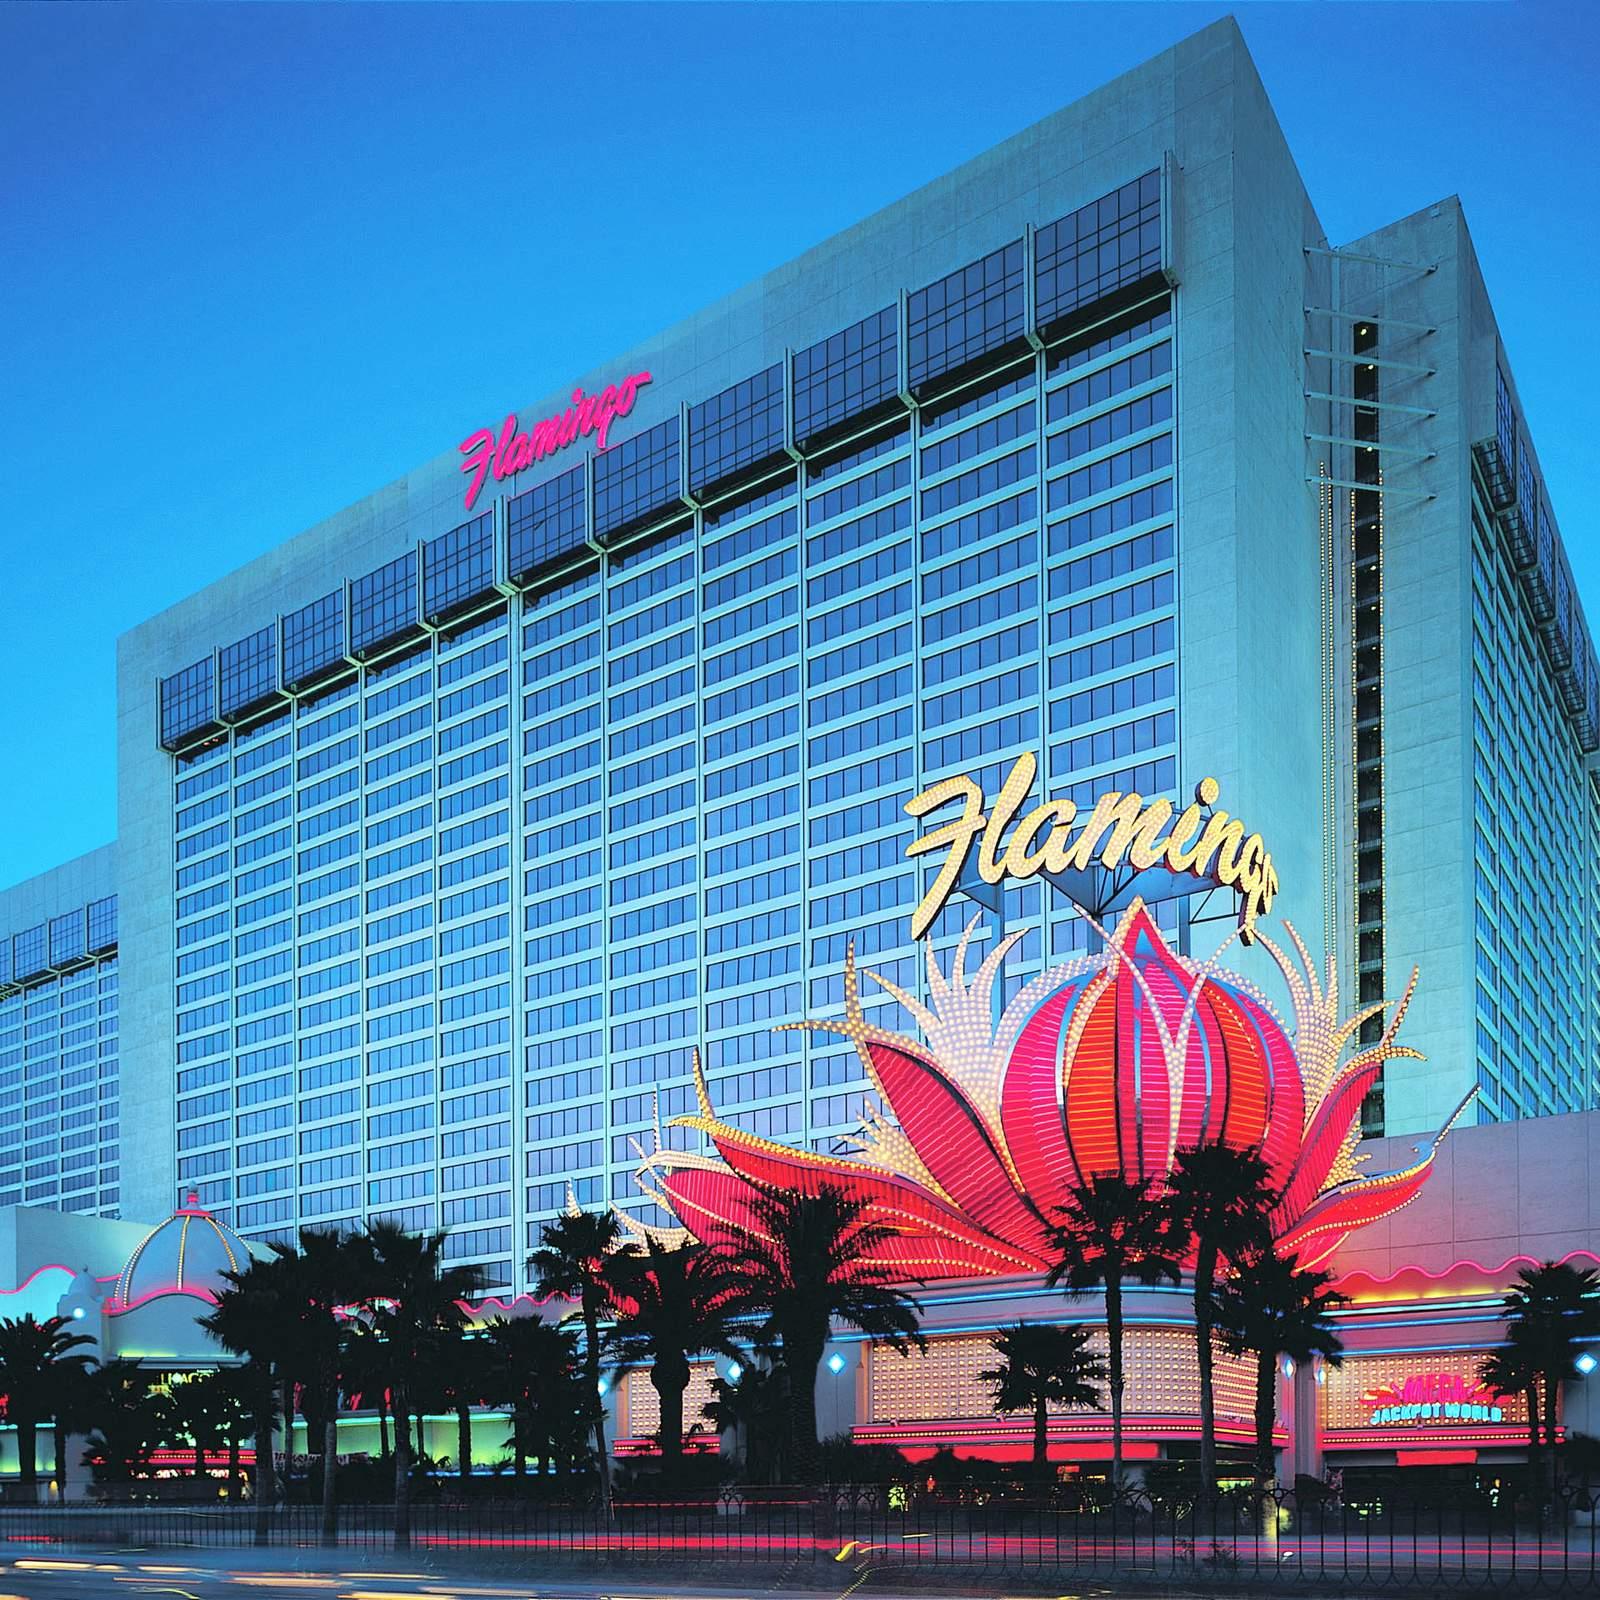 Flamingo hotel las vegas bei nacht aus dem heliopter - Flamingo Las Vegas